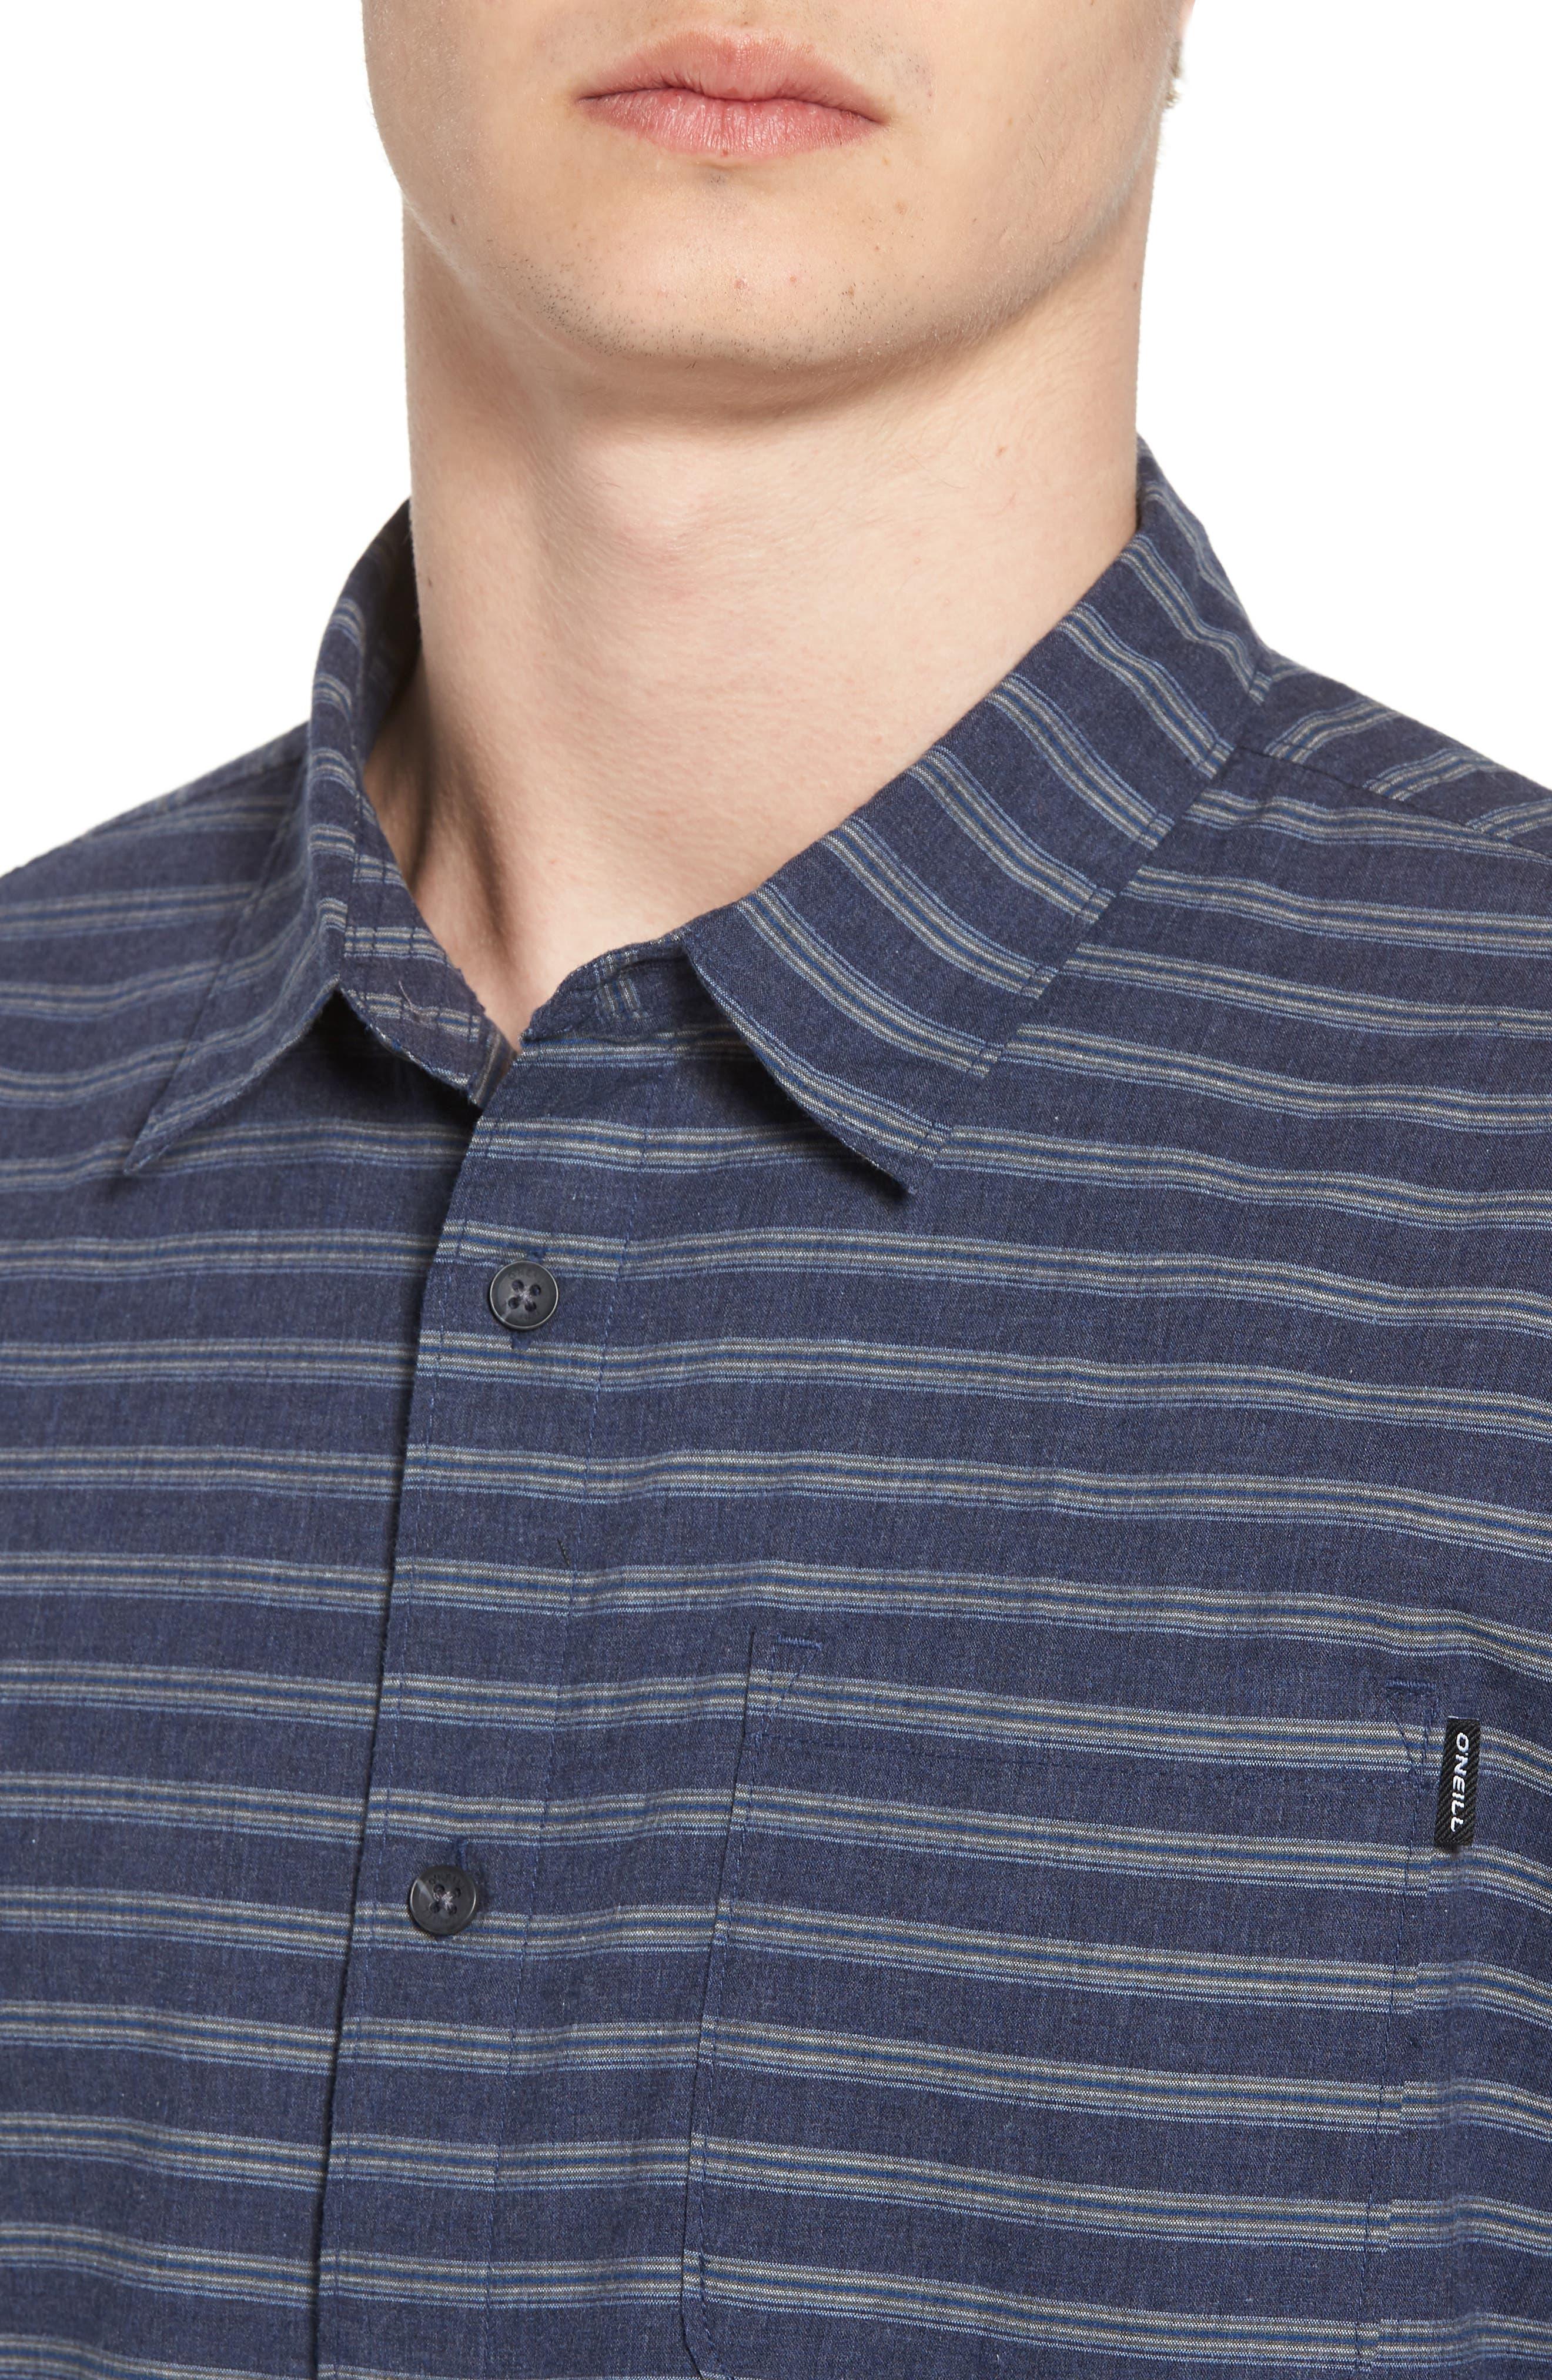 Stag Short Sleeve Shirt,                             Alternate thumbnail 4, color,